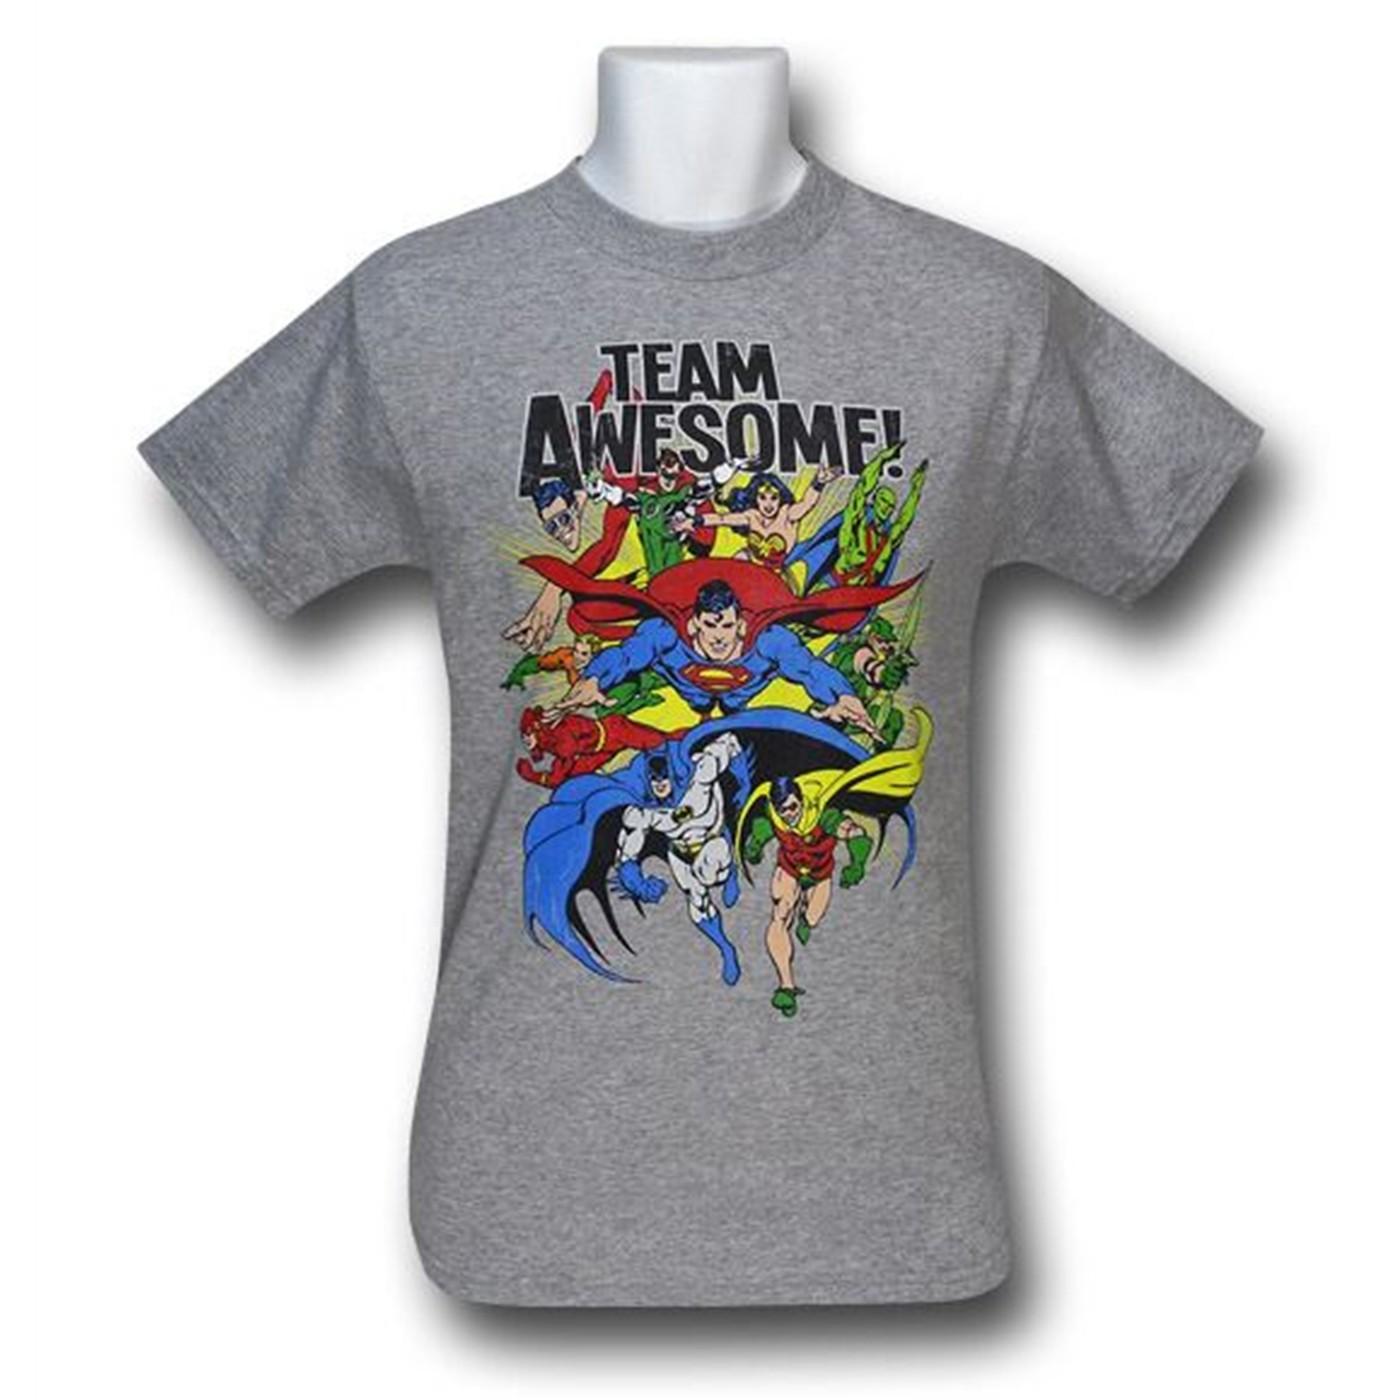 JLA Awesome Team Youth T-Shirt